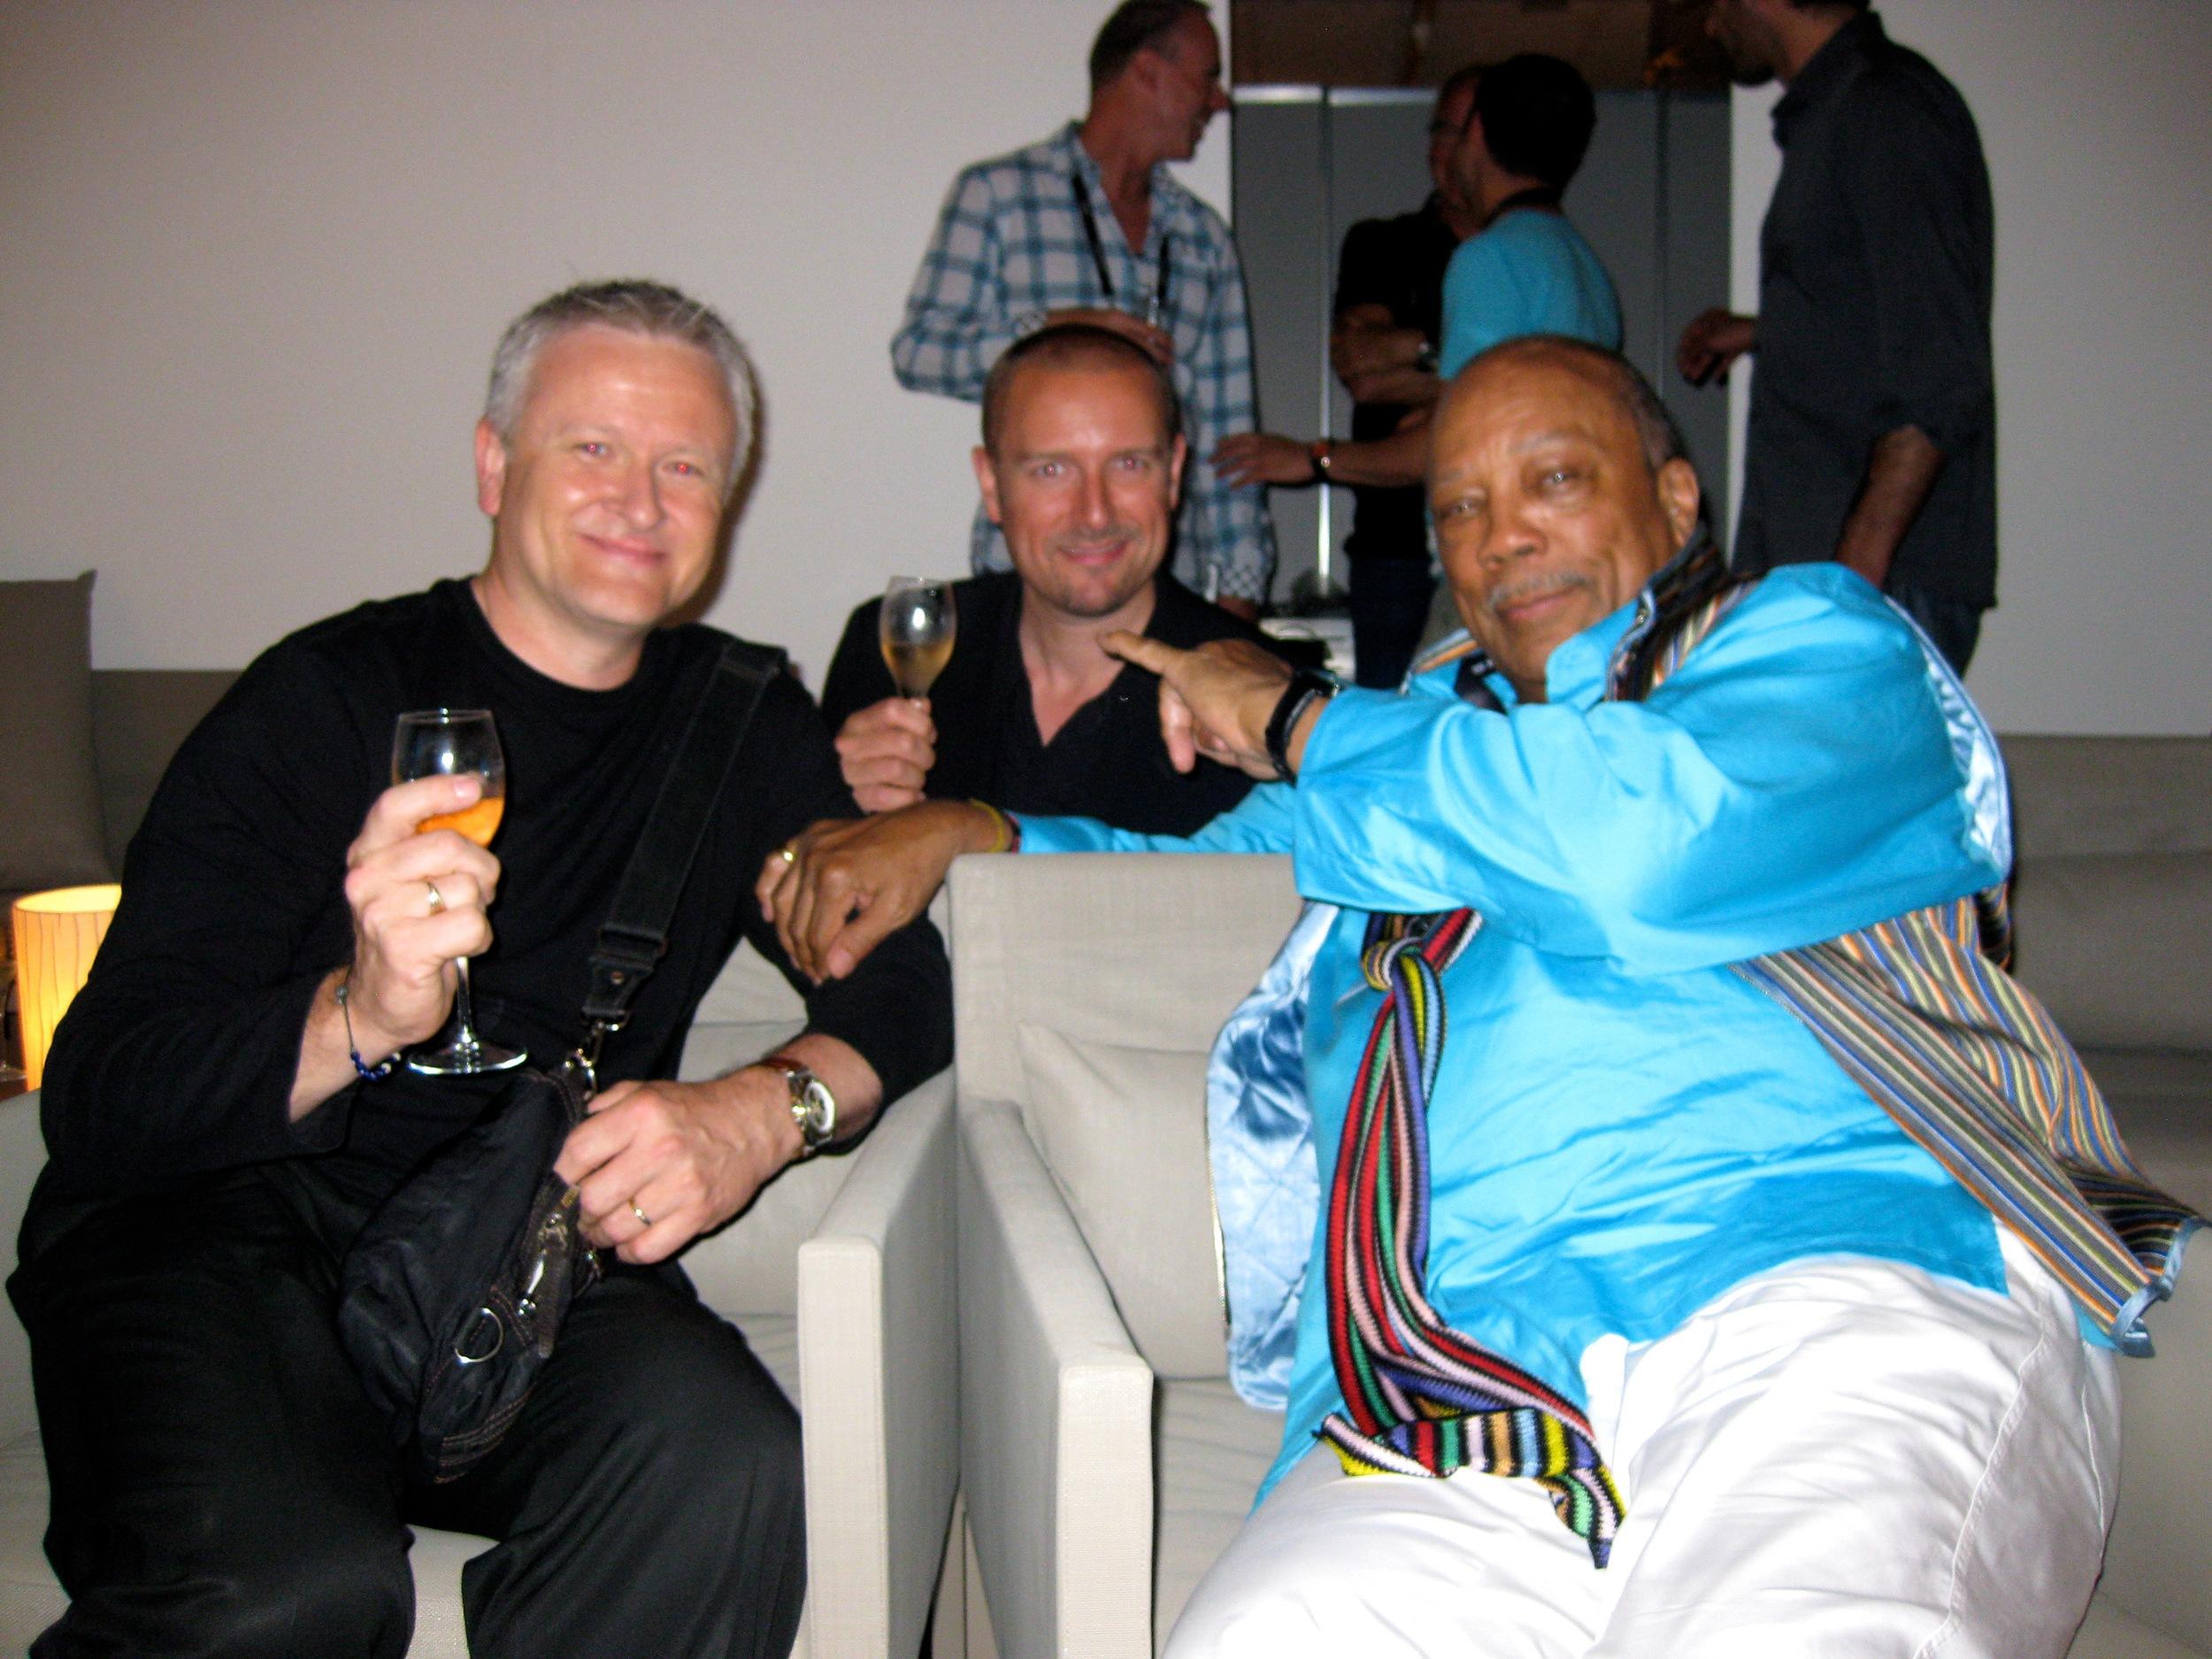 Montreux Jazz Festival, 2010. Mike Lovatt, MW, Quincy Jones